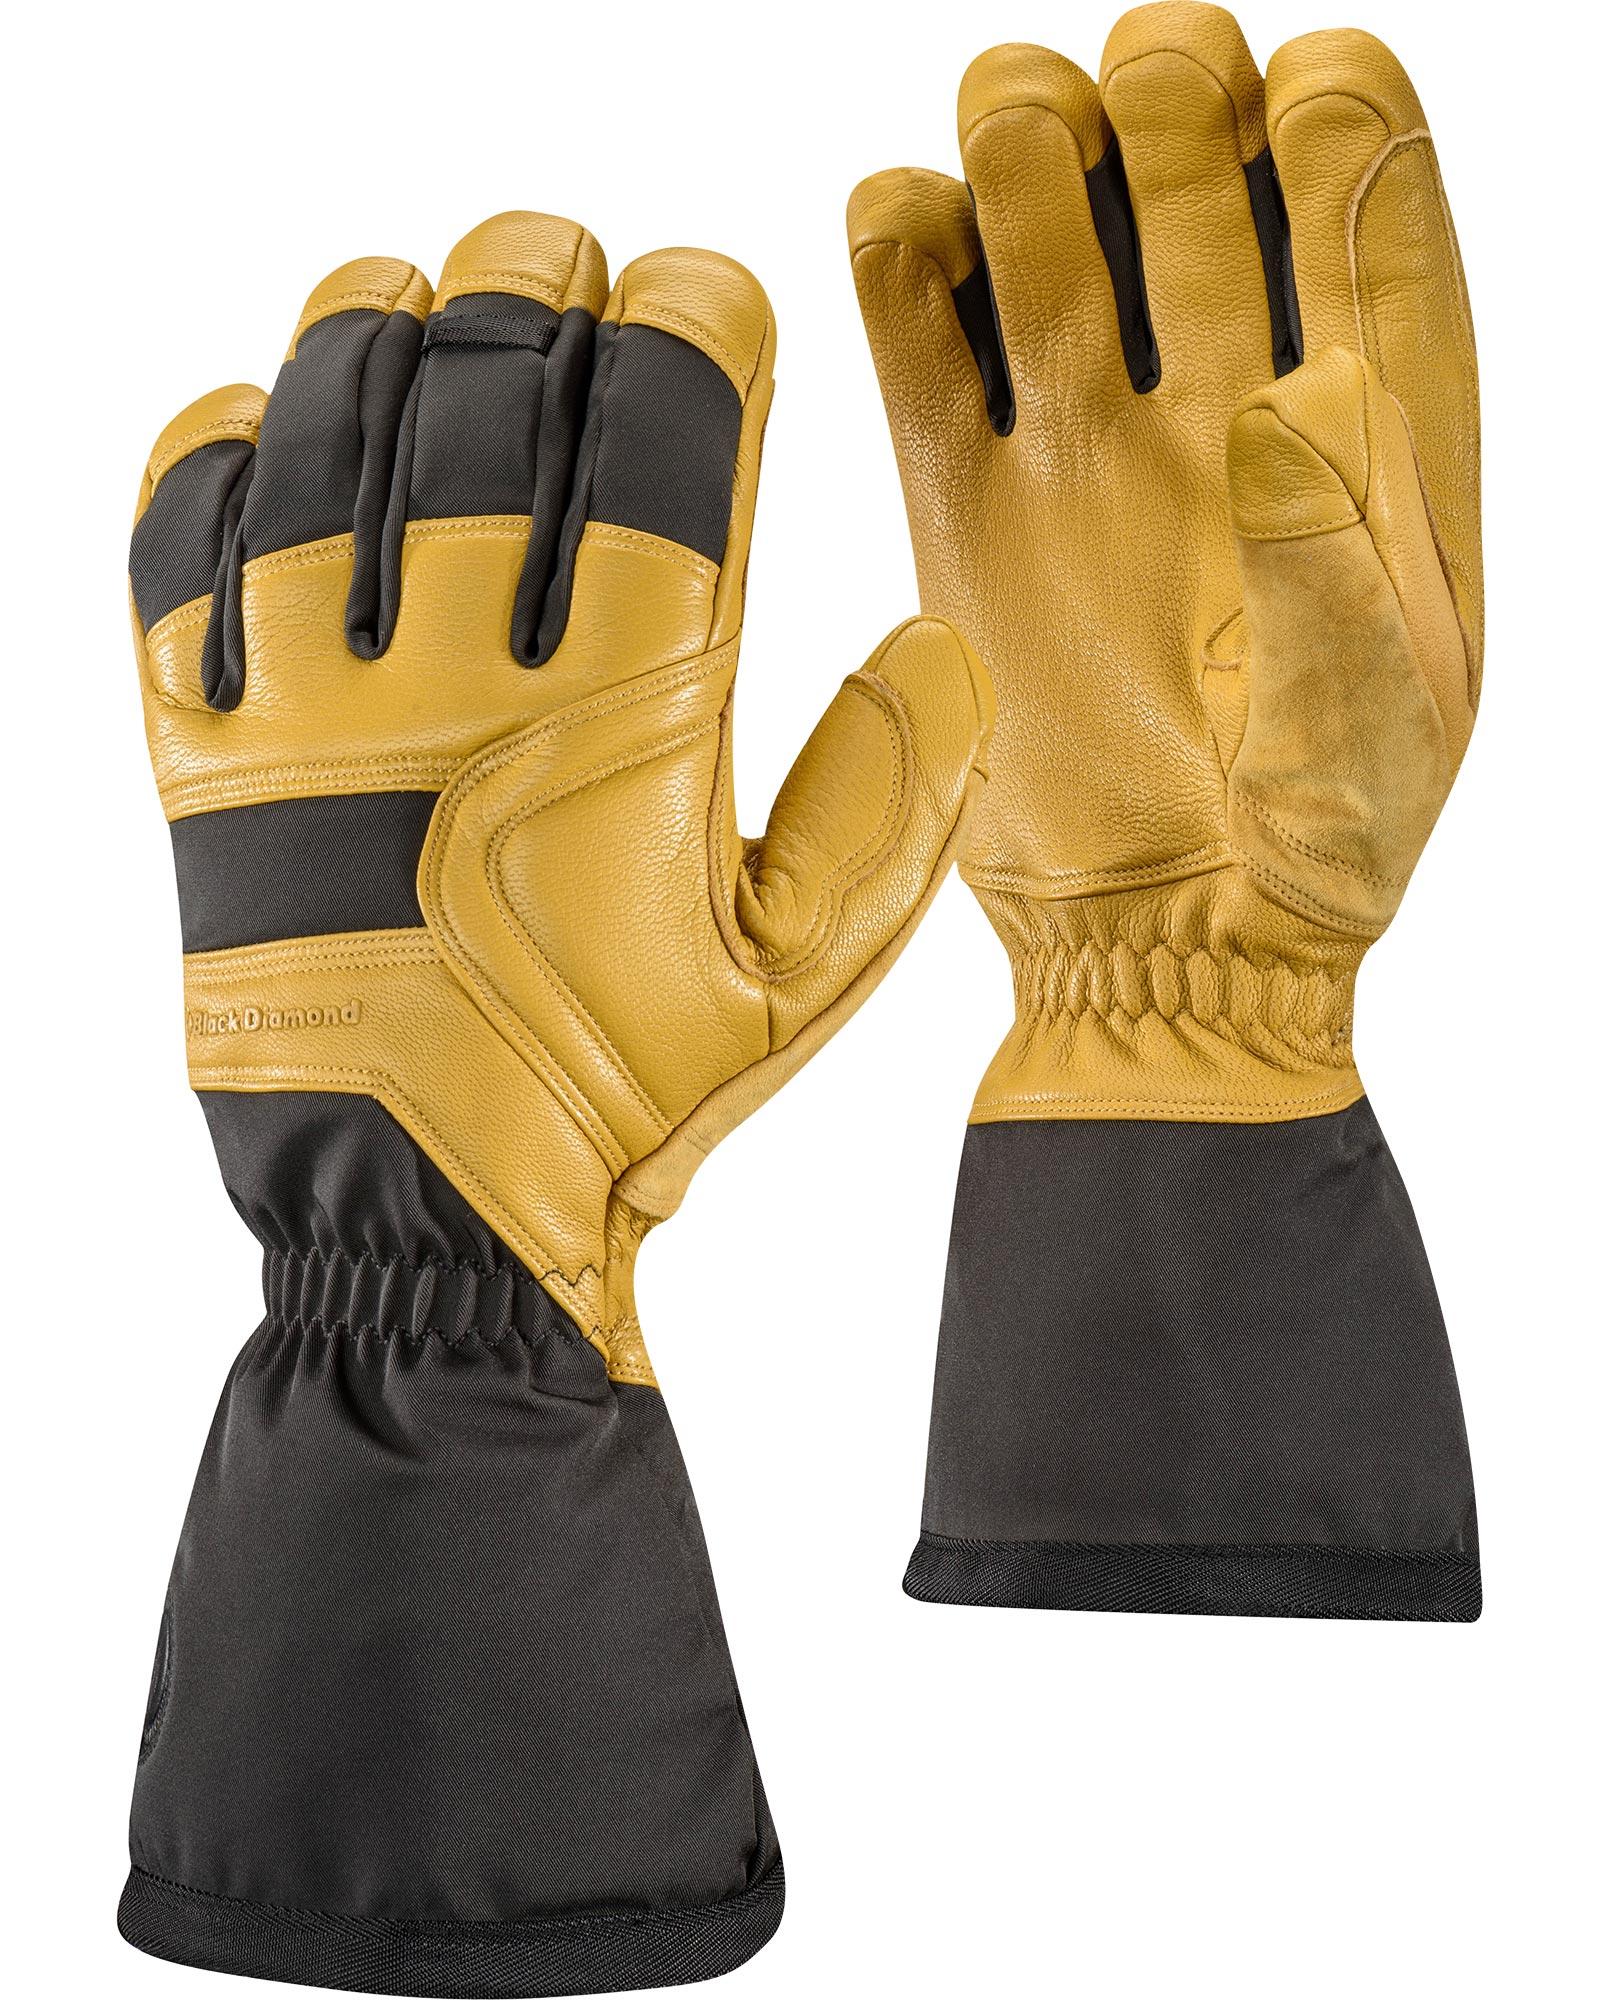 Black Diamond Crew GORE-TEX Gloves 0